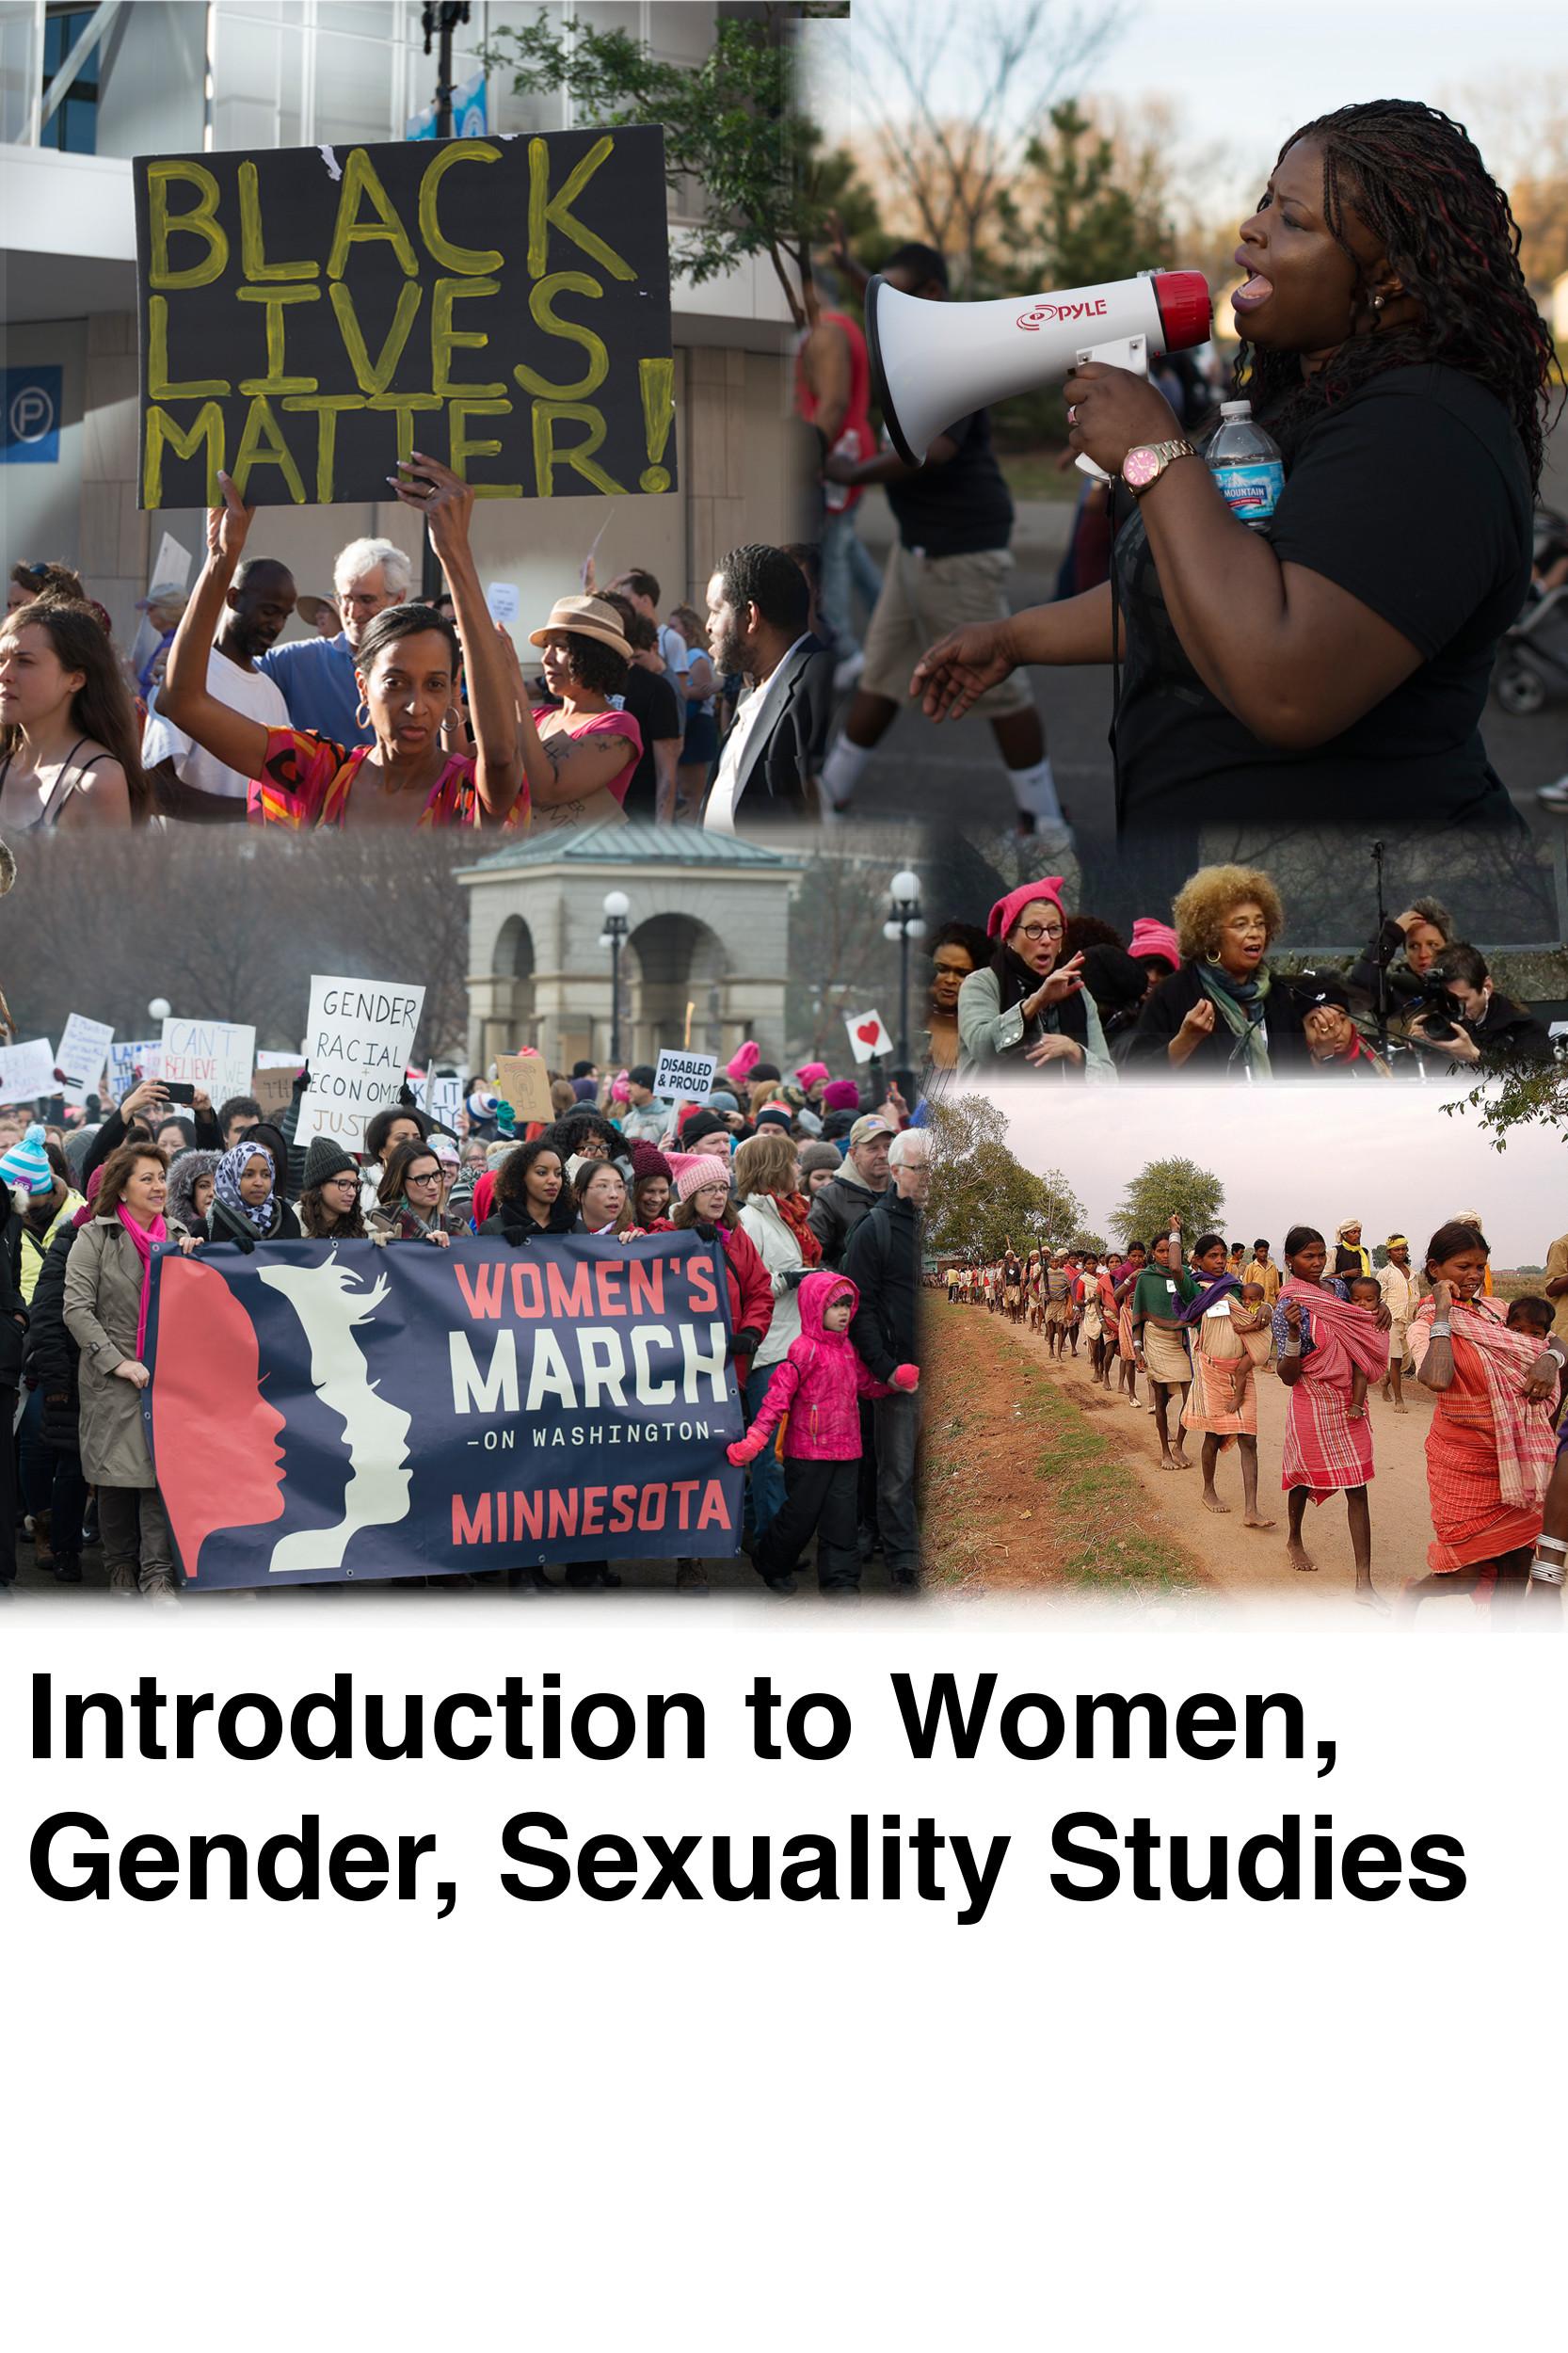 GST 200 - Intro to Gender Studies - Intro to Women, Gender, Sexuality Studies